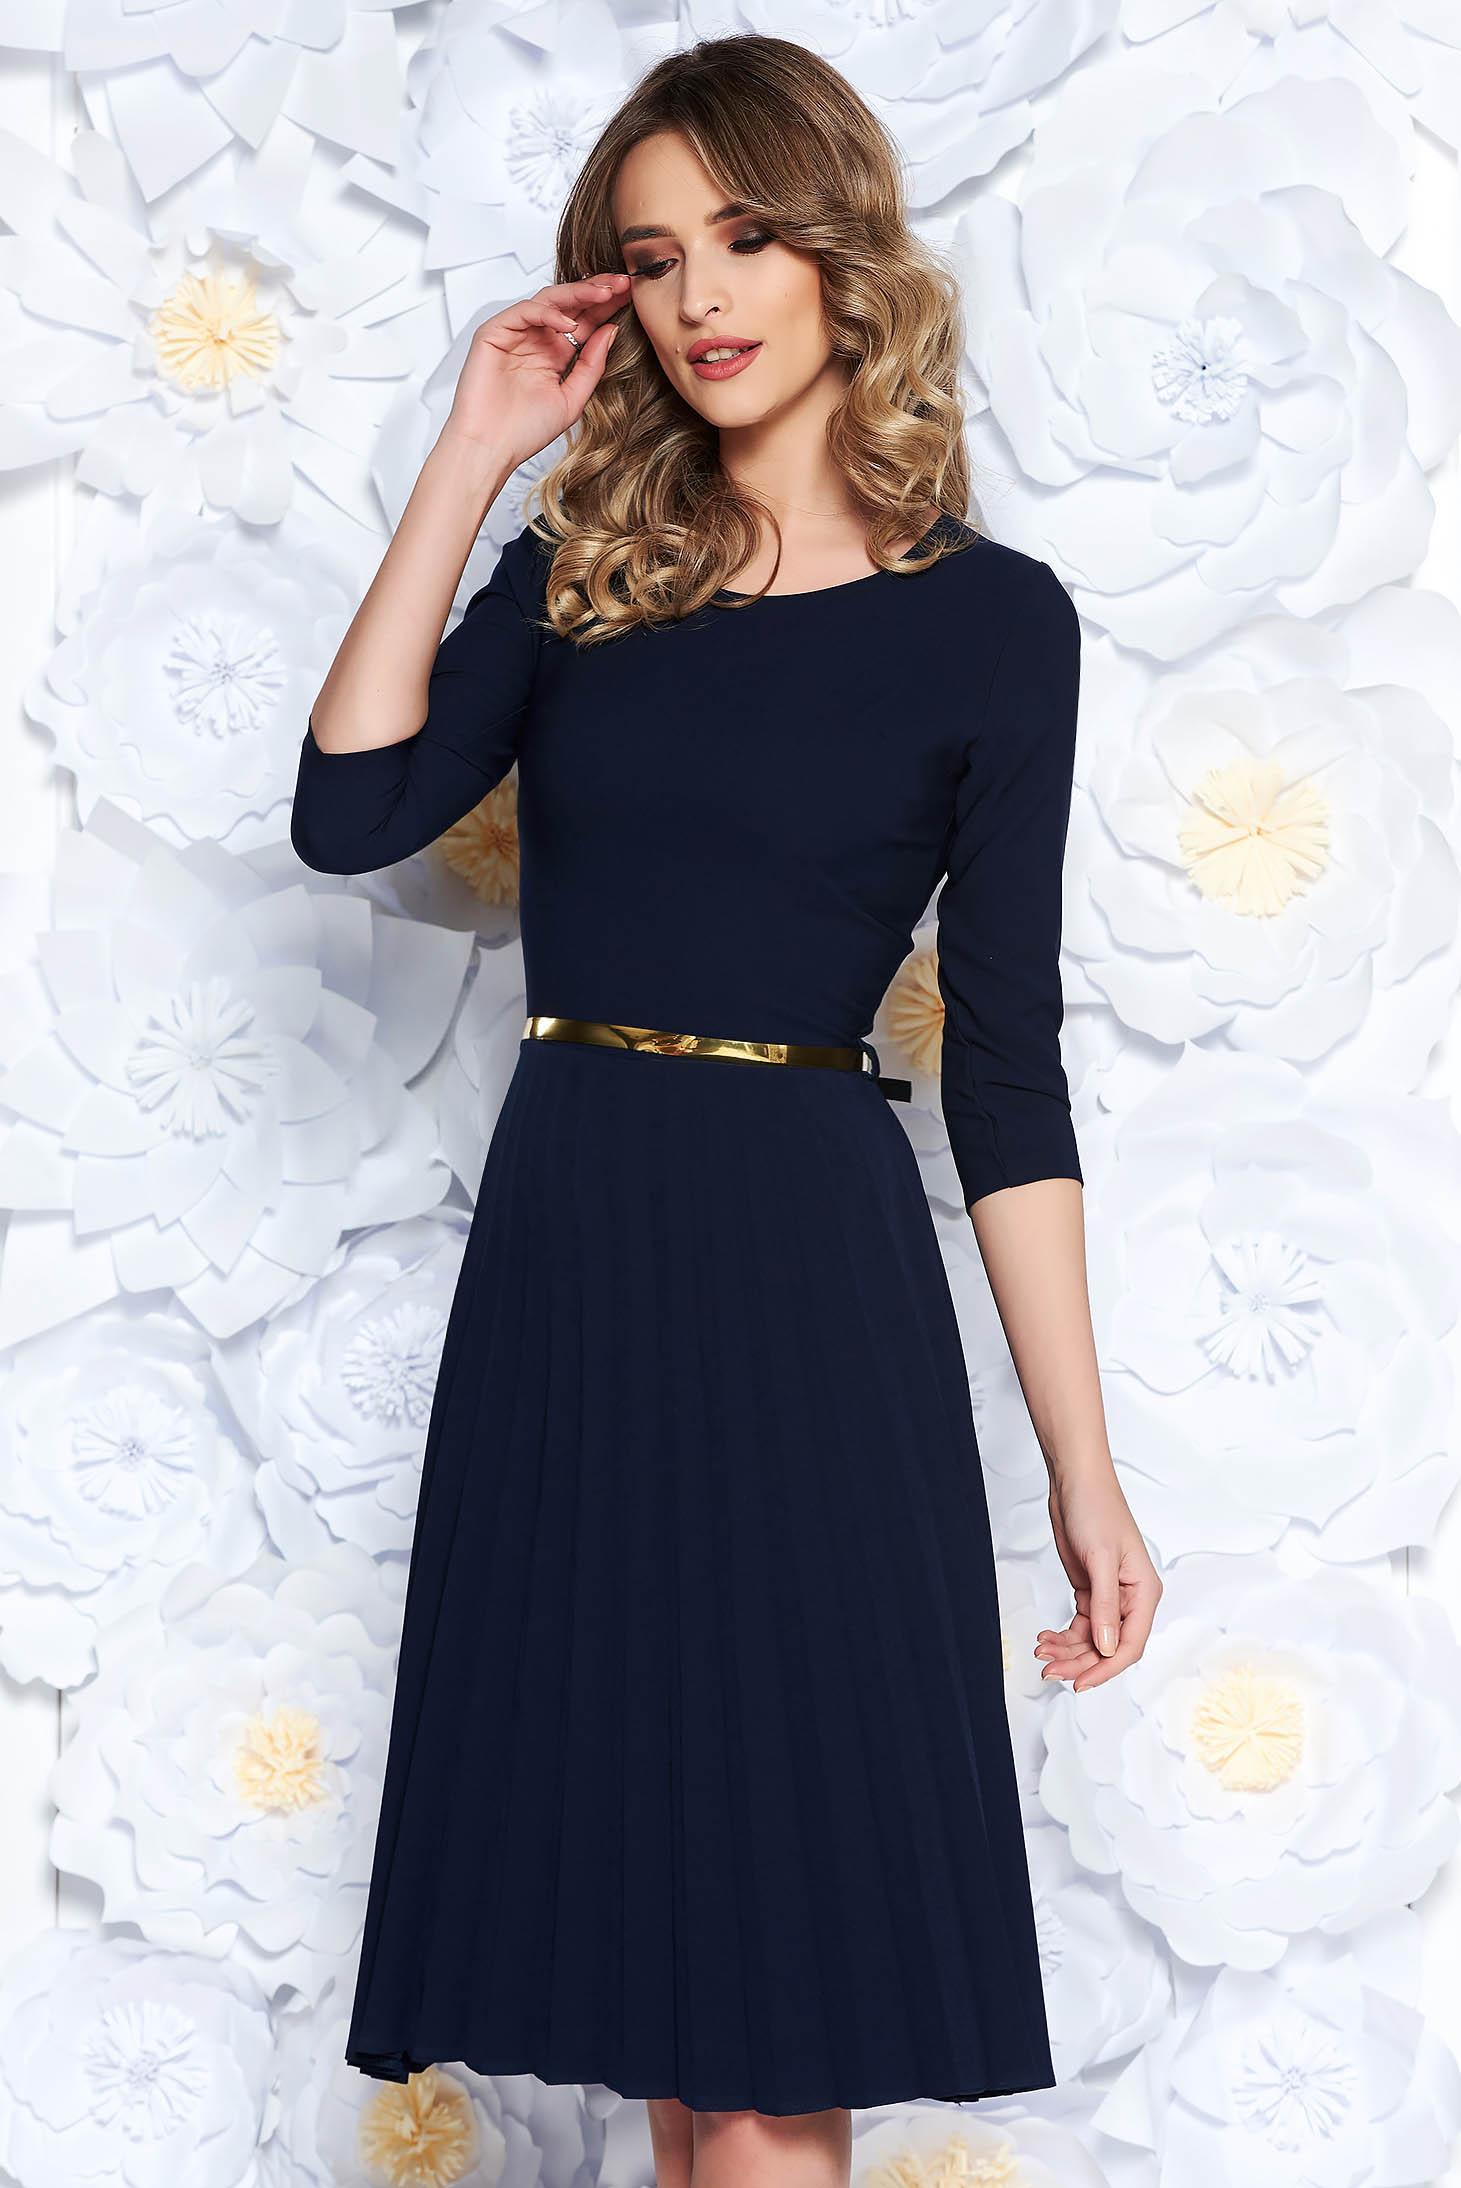 Darkblue elegant folded up cloche dress flexible thin fabric/cloth accessorized with belt